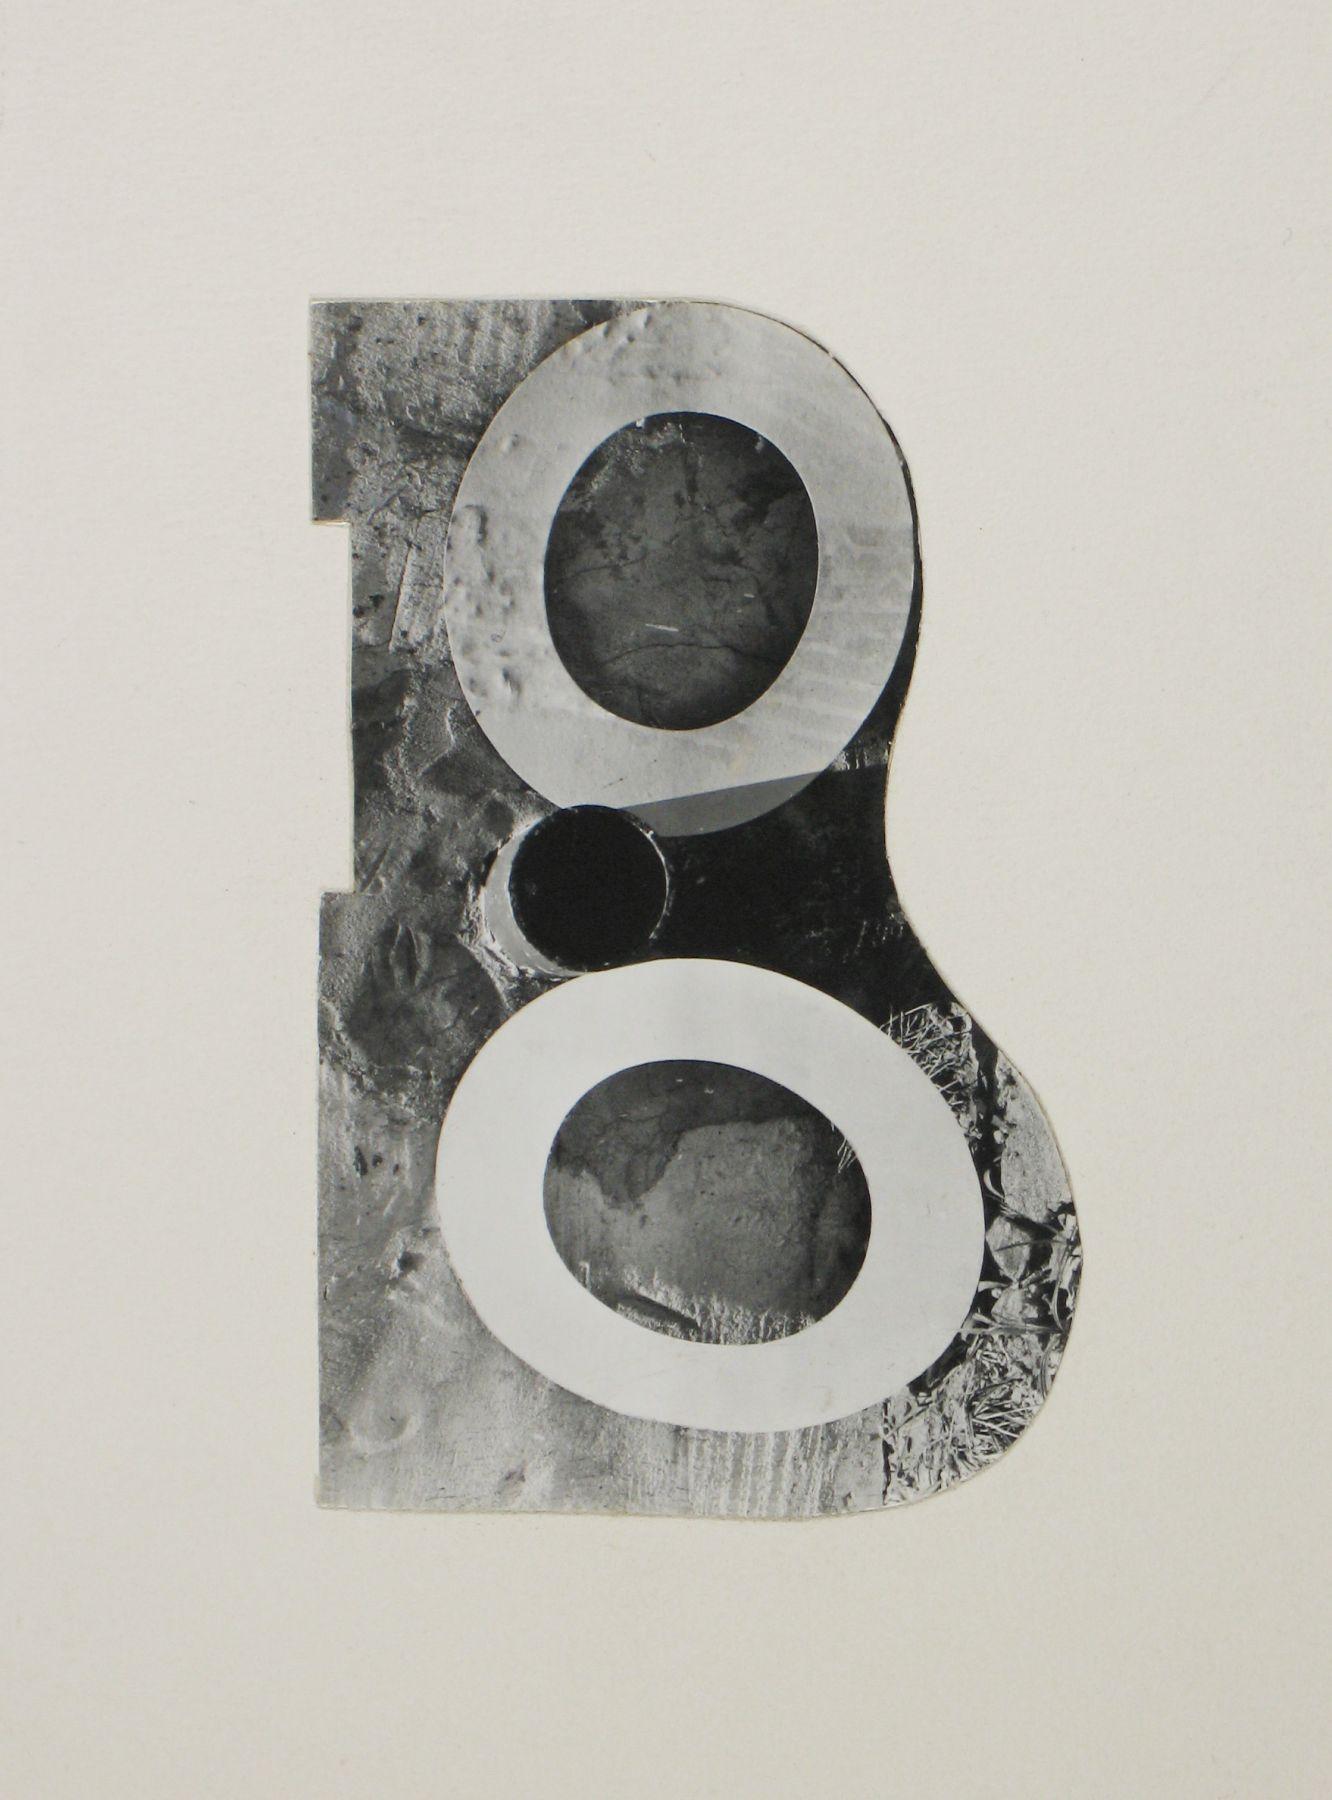 Arnold Newman - Cutout, West Palm Beach, FL, 1941 - Howard Greenberg Gallery - 2018